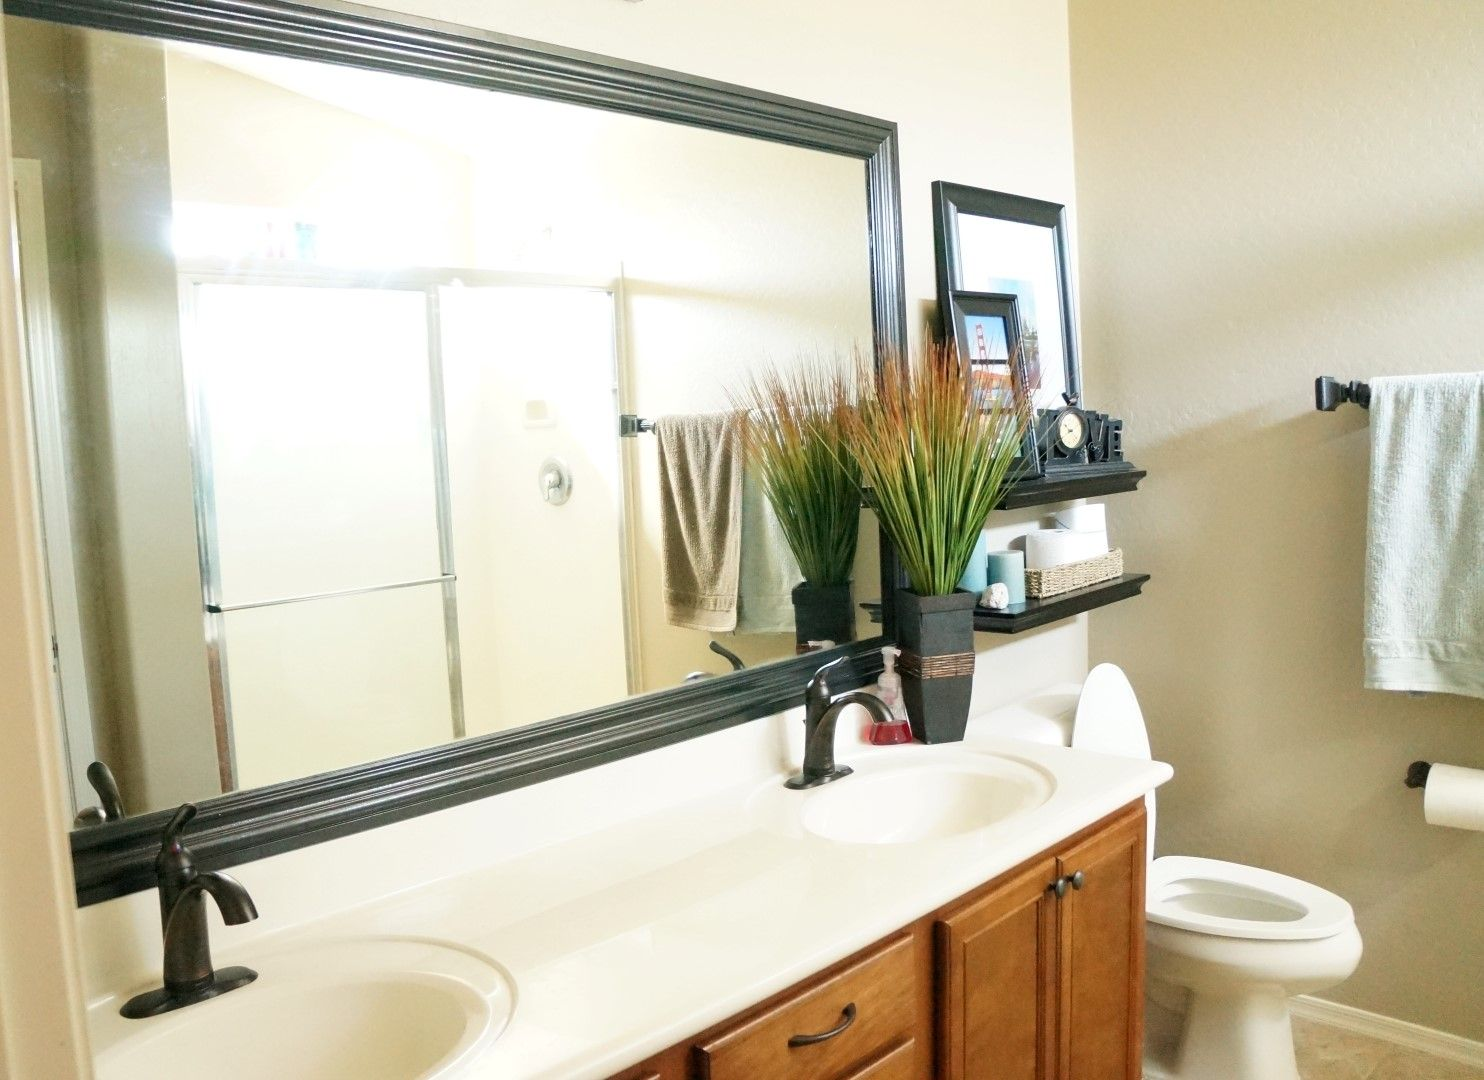 How to Frame a Mirror  DIY Bathroom Mirror Frames